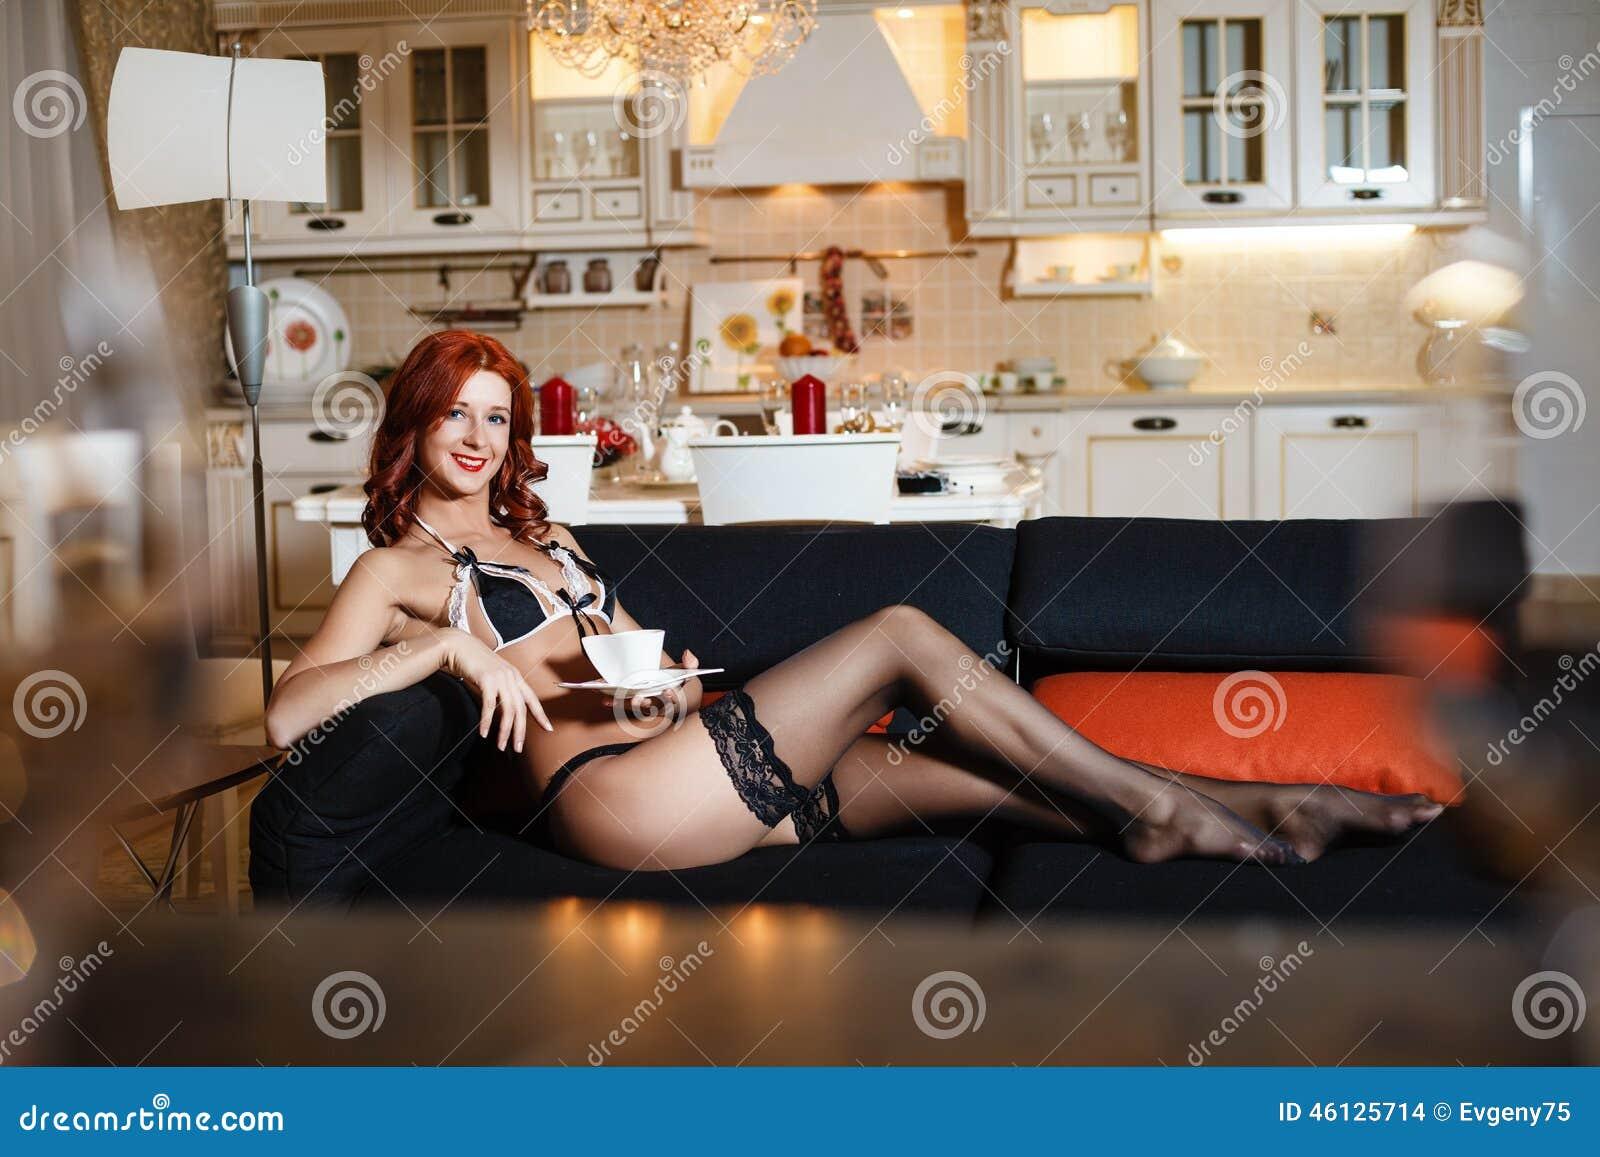 Real wife slut